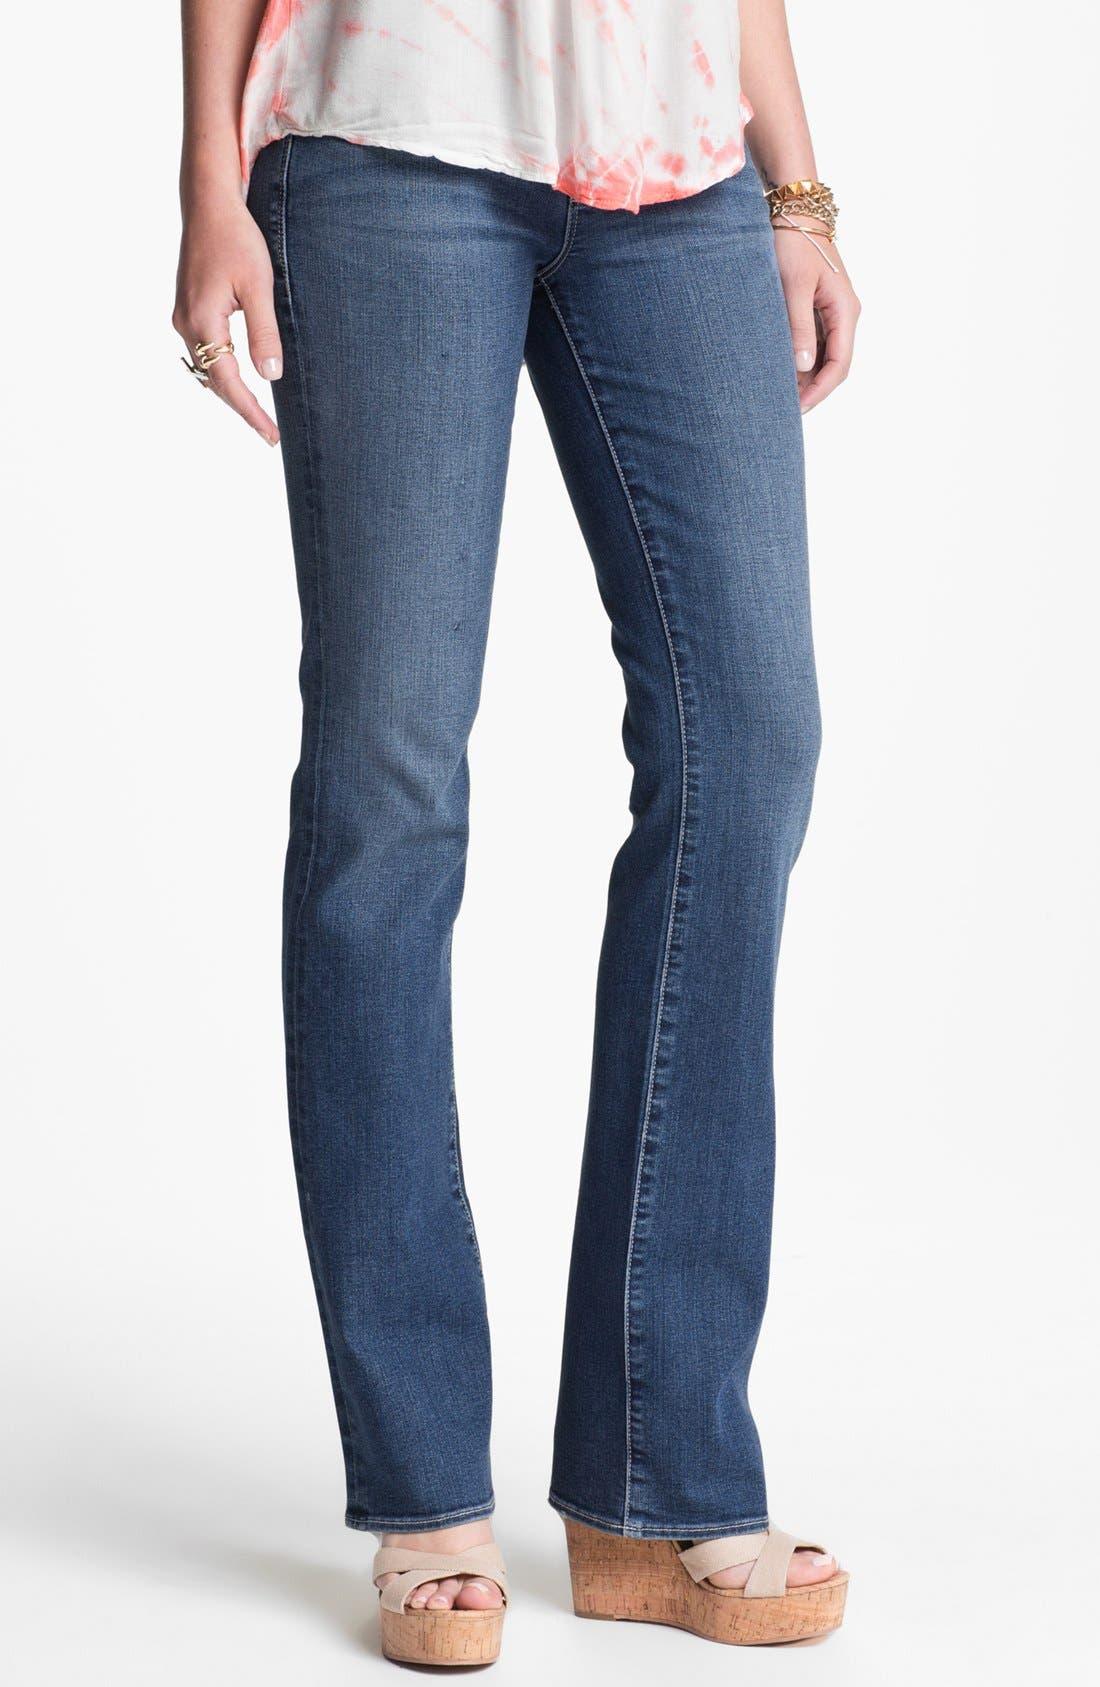 Main Image - Articles of Society 'Kendra' Bootcut Jeans (Medium Wash) (Juniors)